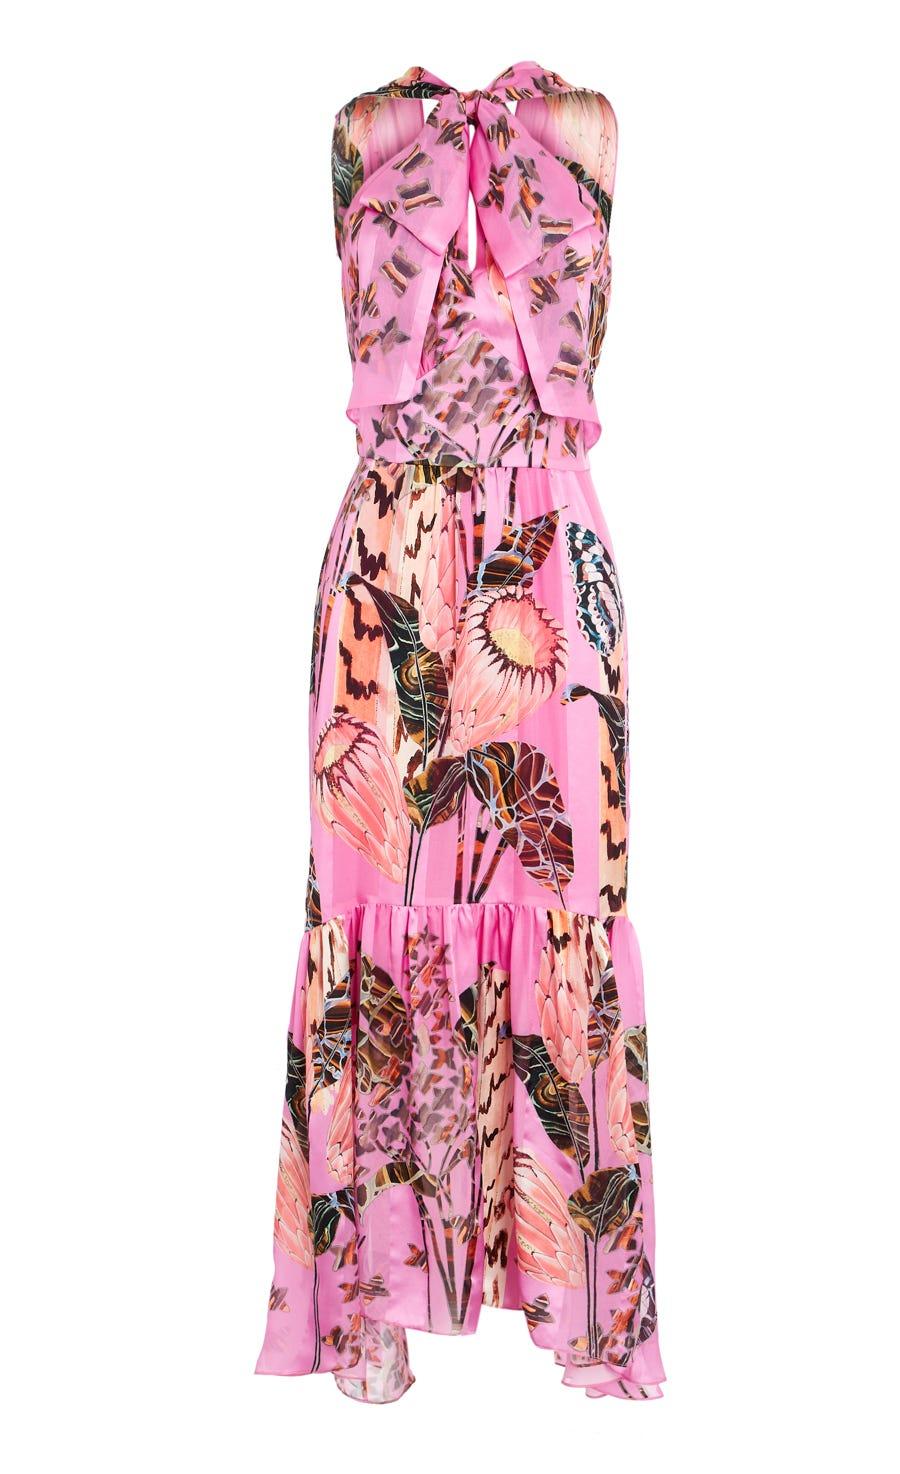 Harmony Print Tie Dress